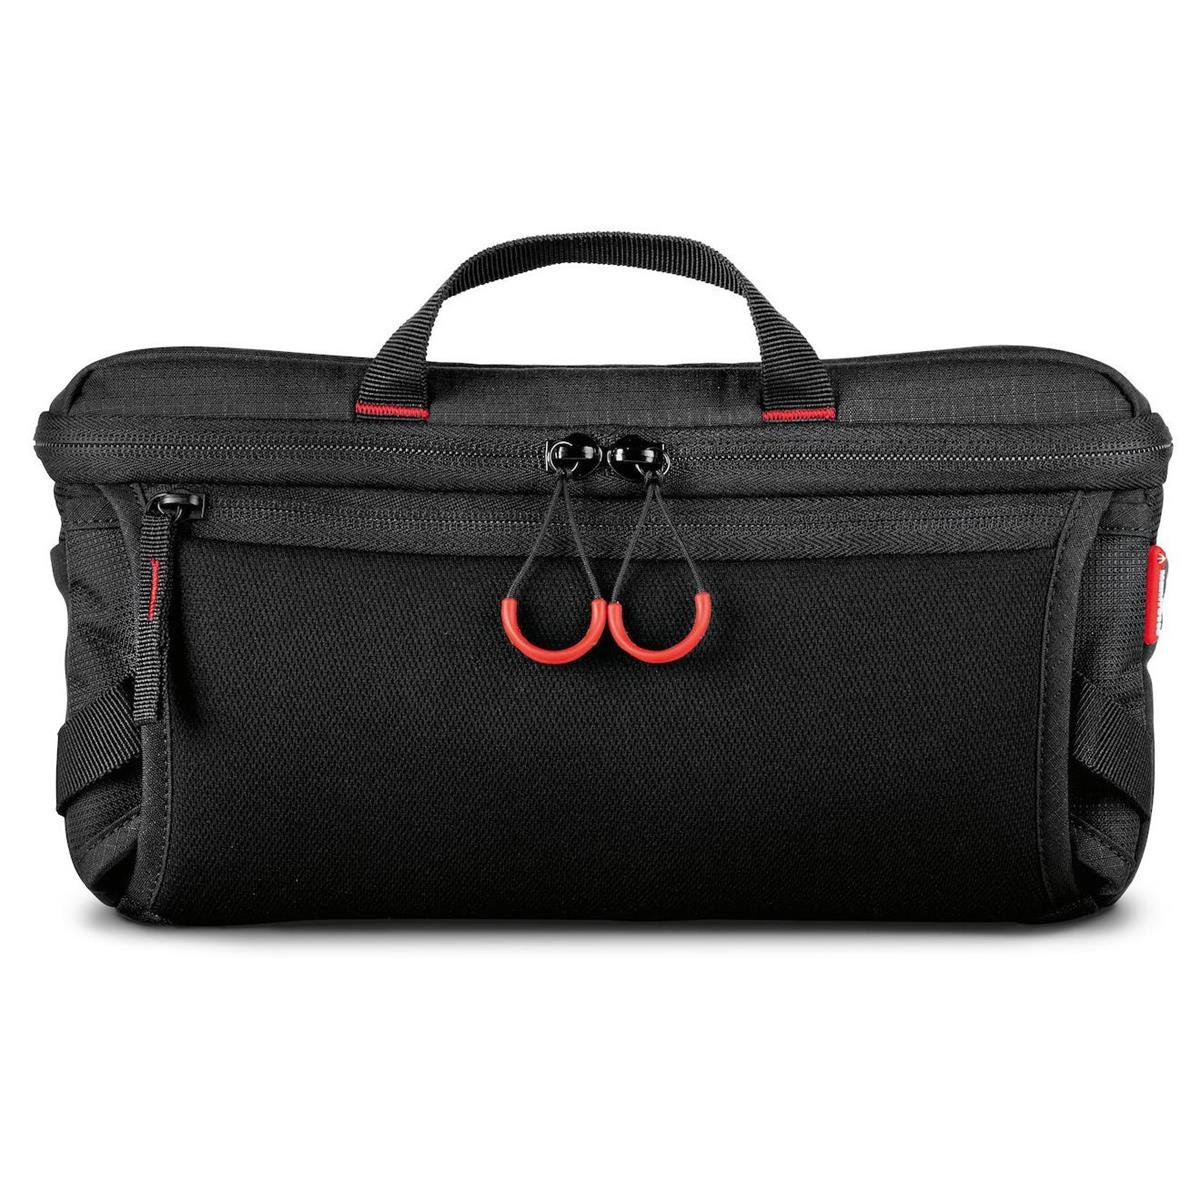 Manfrotto Aviator M1 Sling Bag for DJI Mavic Drone